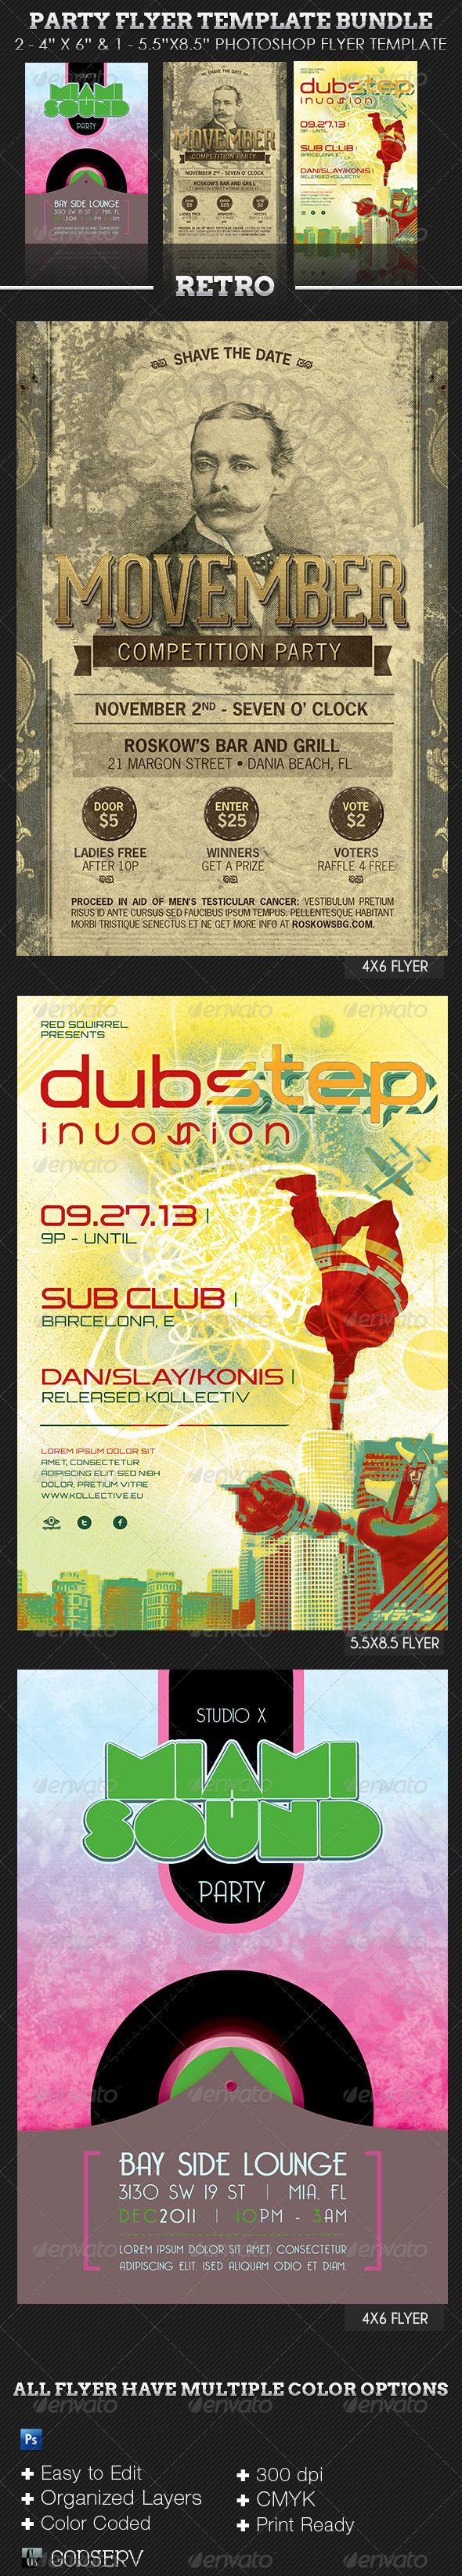 Retro Party Flyer Template Bundle - Clubs & Parties Events